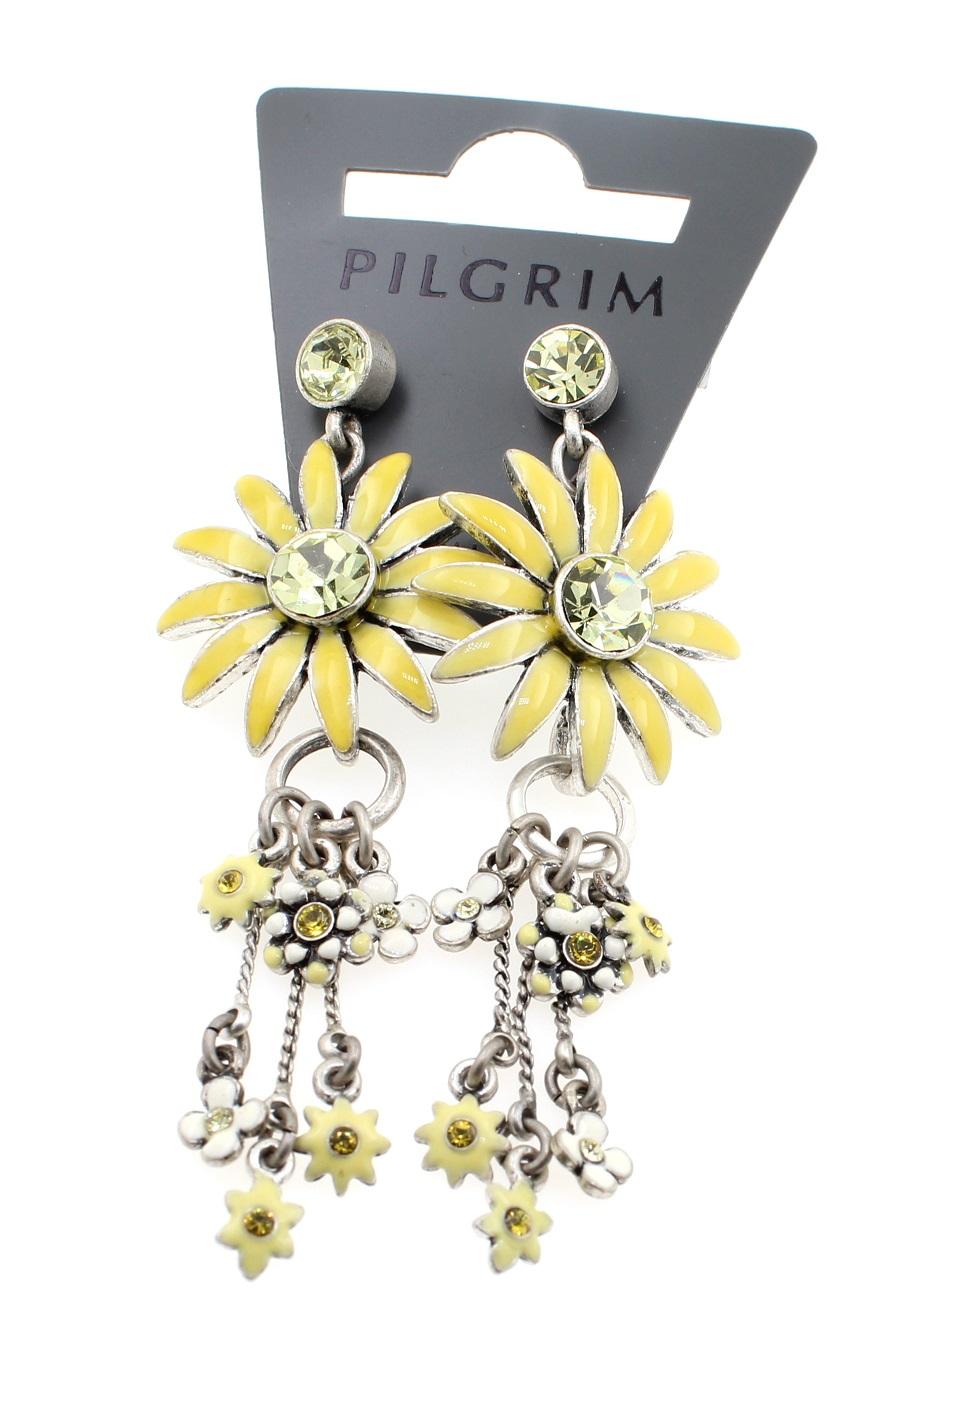 PILGRIM - Daisy - Elaborate Earrings - Oxidised Silver Plate/Yellow BNWT